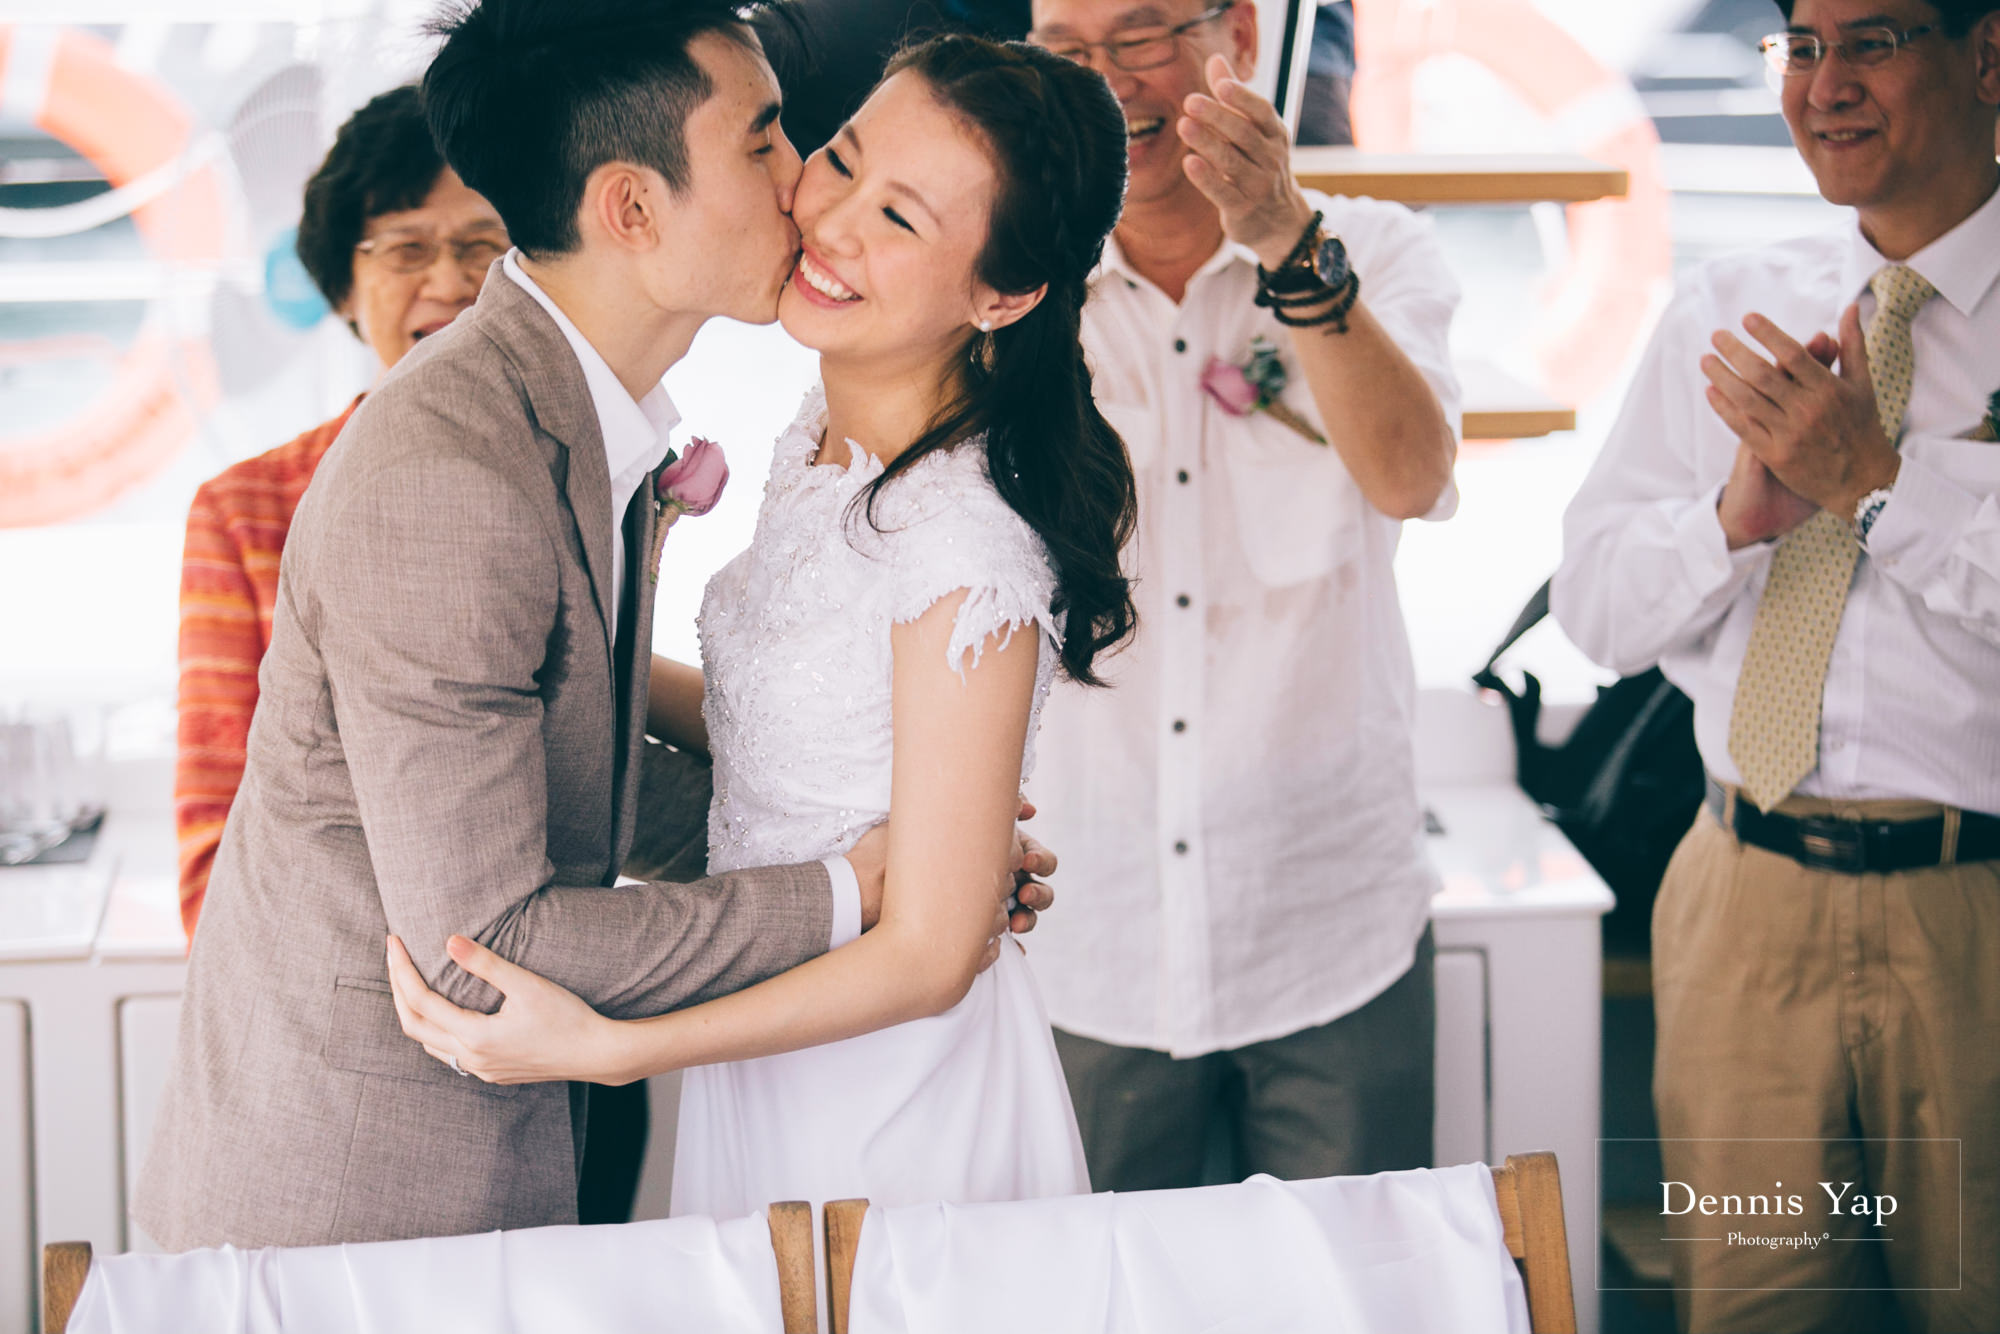 danny sherine wedding reception registration of marriage yacht fun beloved sea dennis yap photography malaysia top wedding photographer-19.jpg